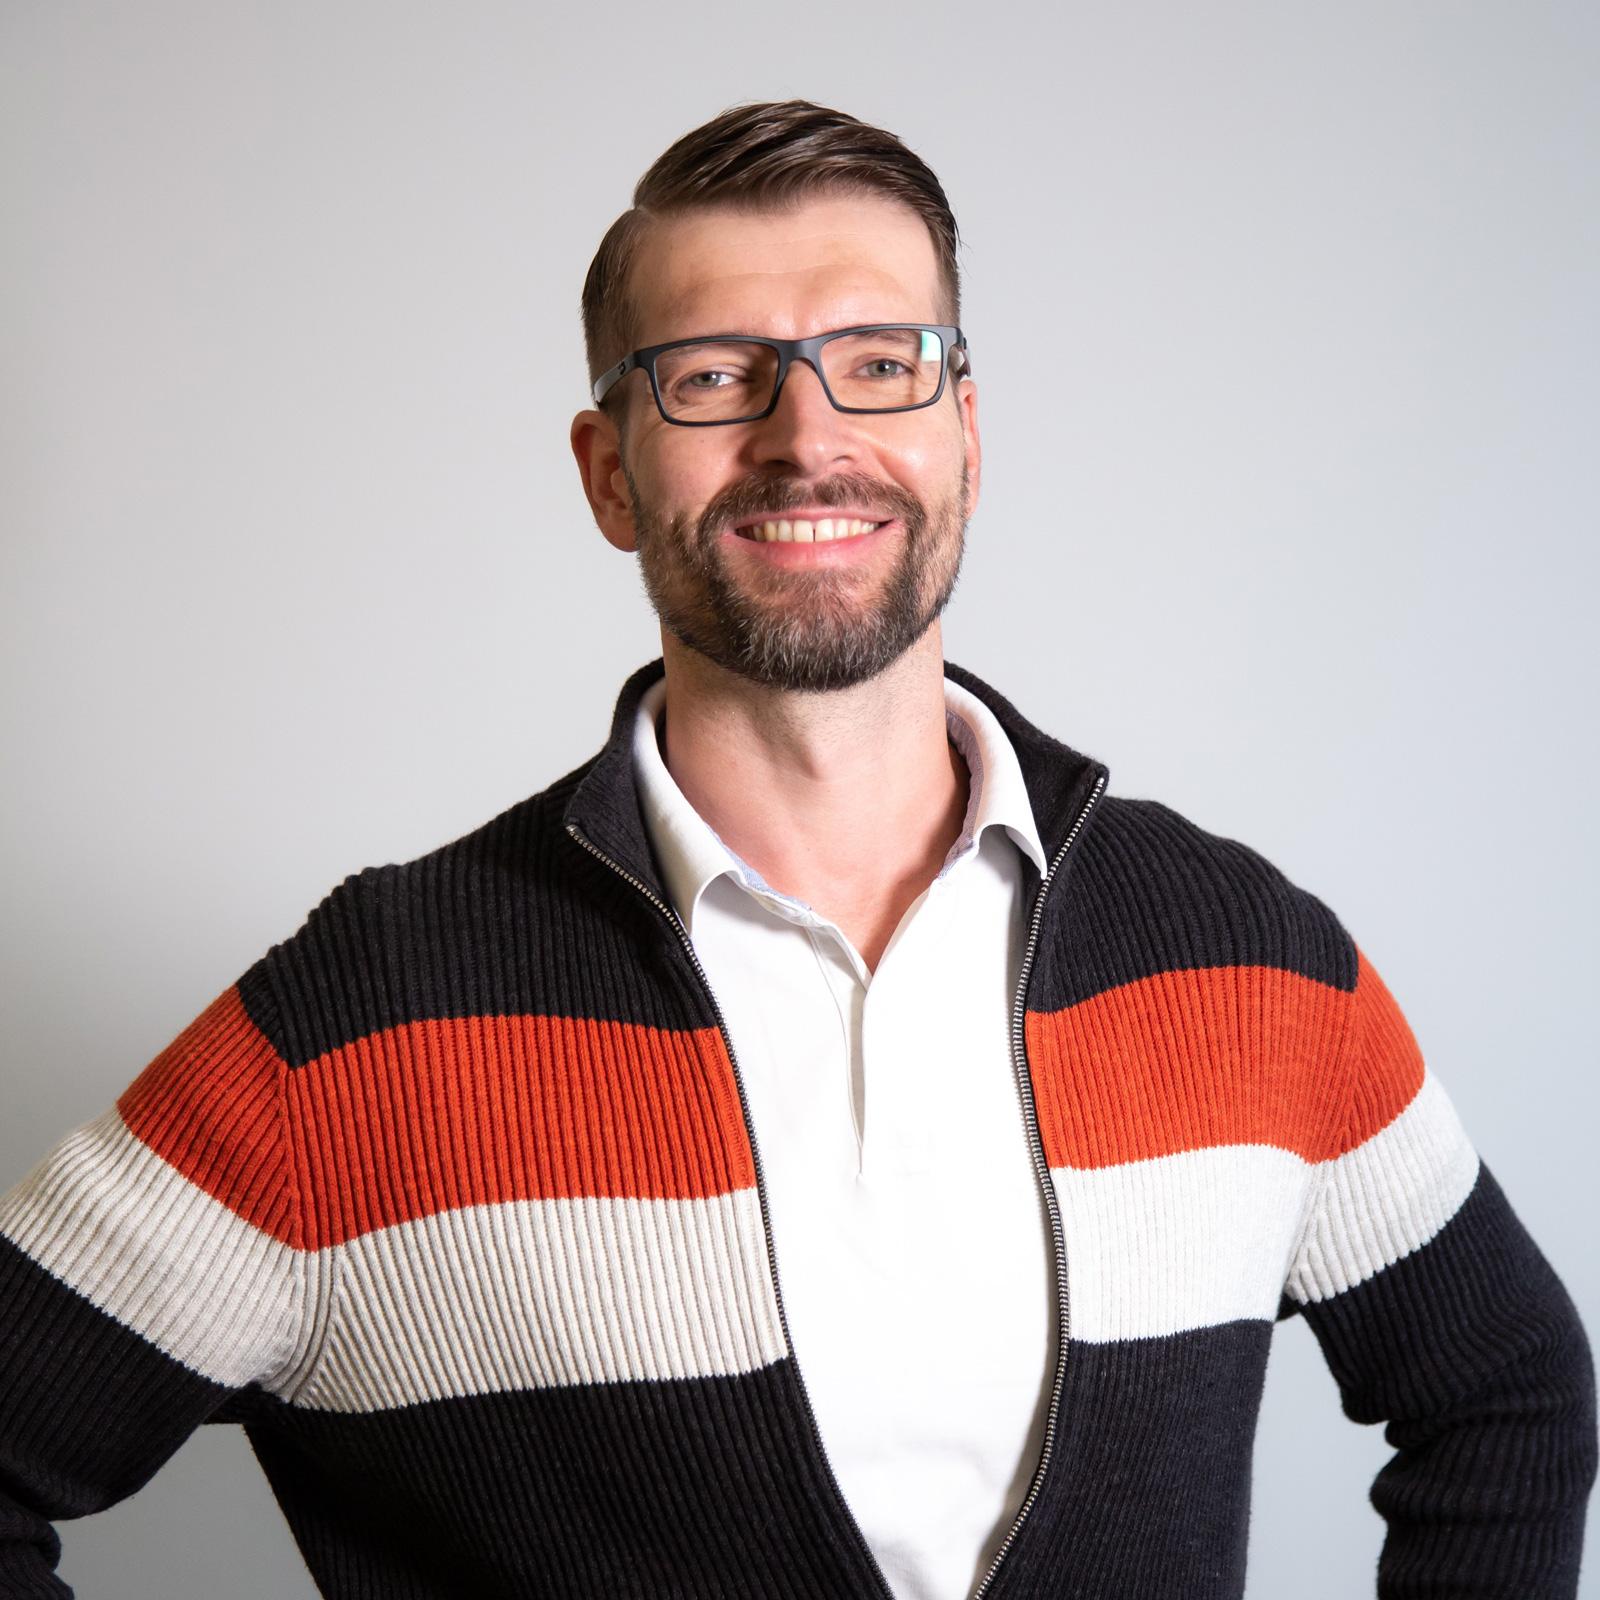 Ernährungstherapeut und -berater Sven Bach